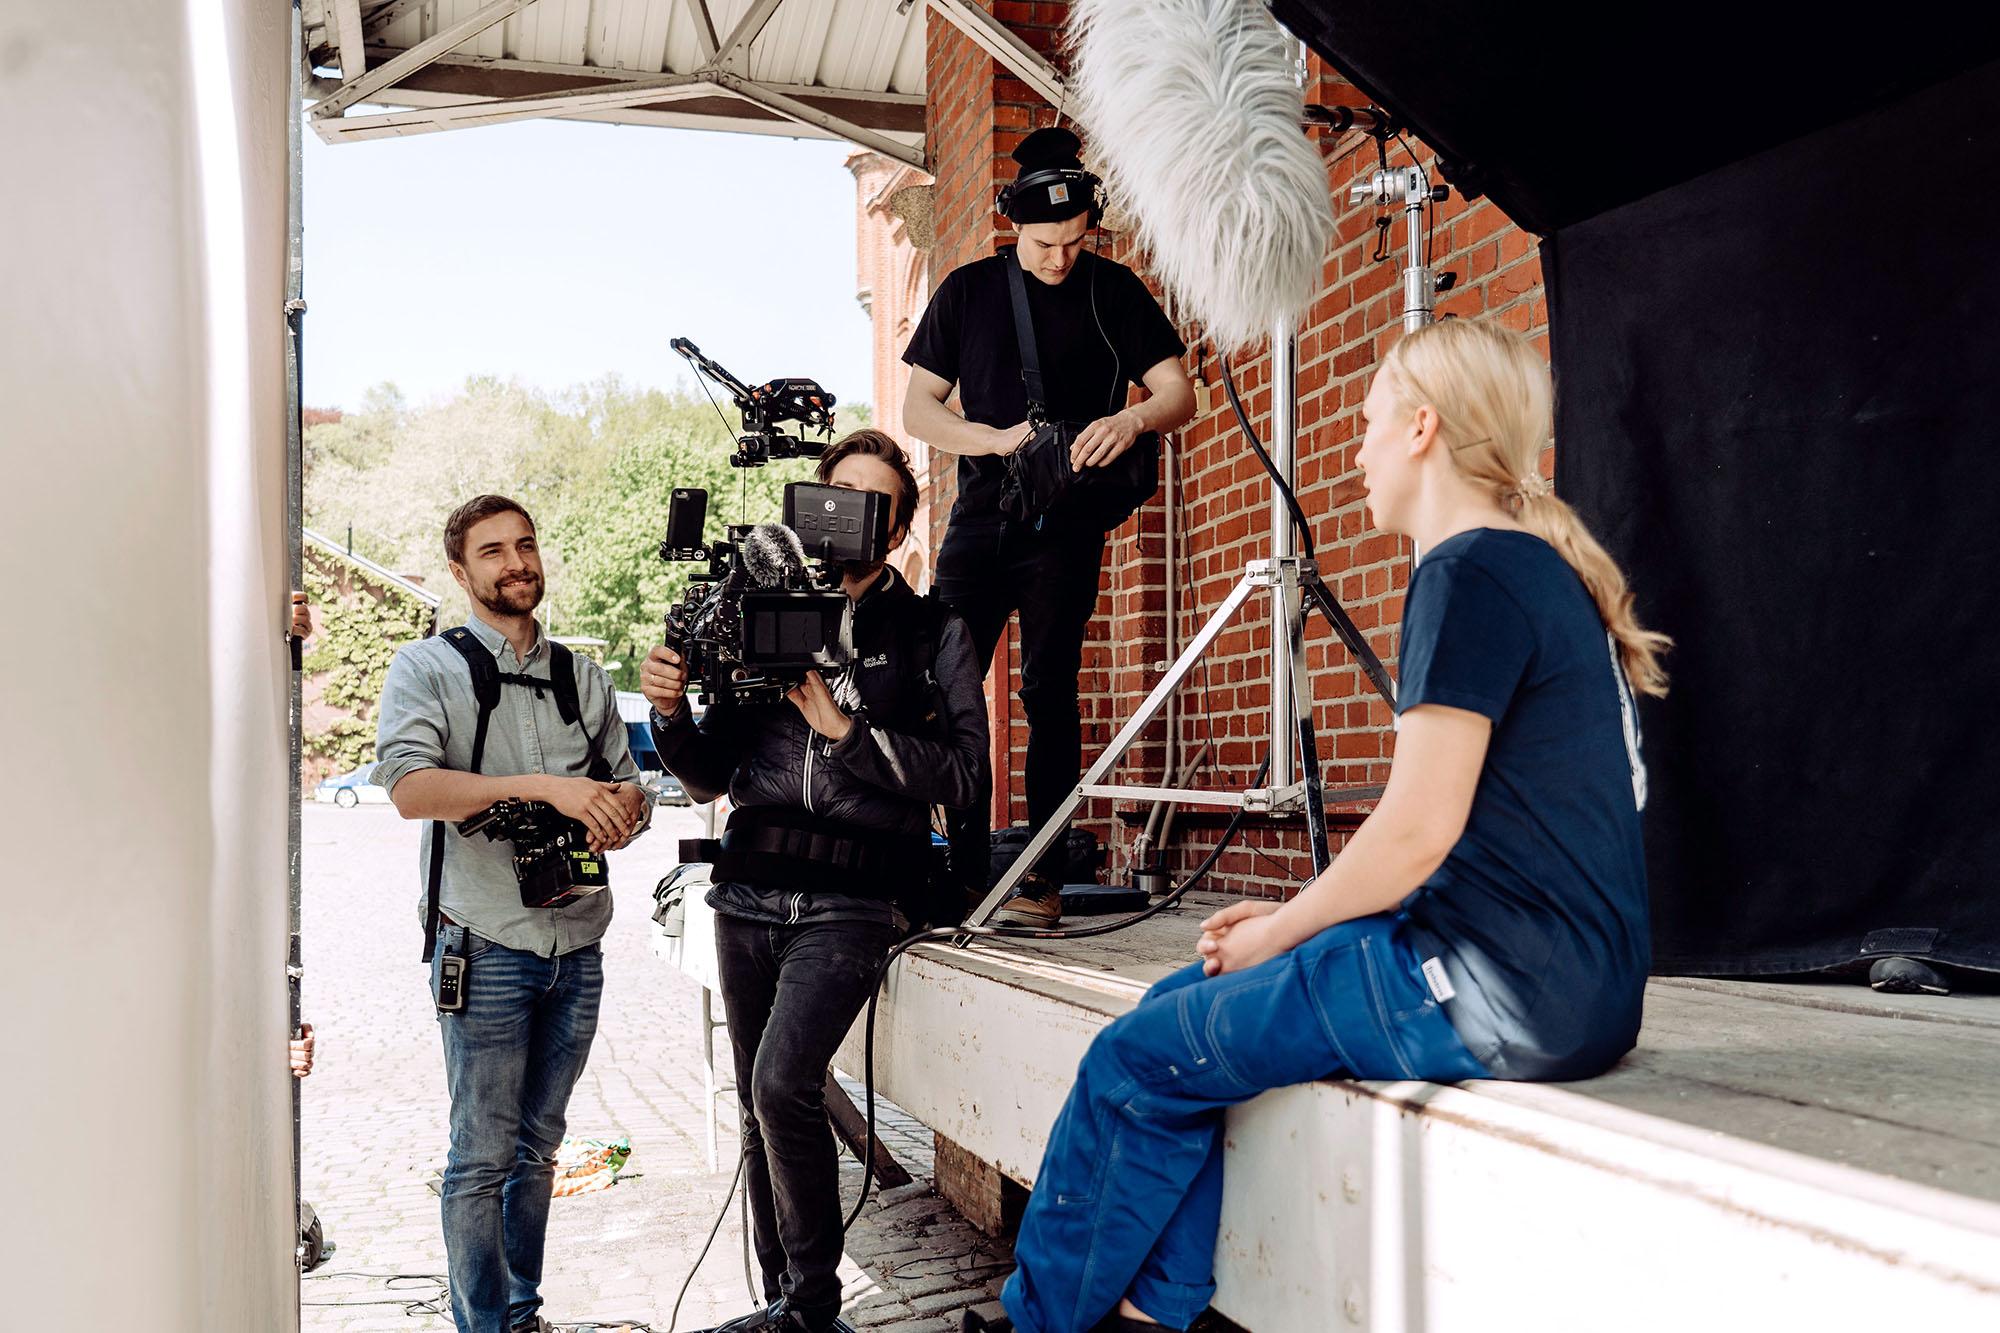 Filmproduktion Imagefilm Landskron Kulturbrauerei Stadt Görlitz Kamera RED Filmteam Dreharbeiten